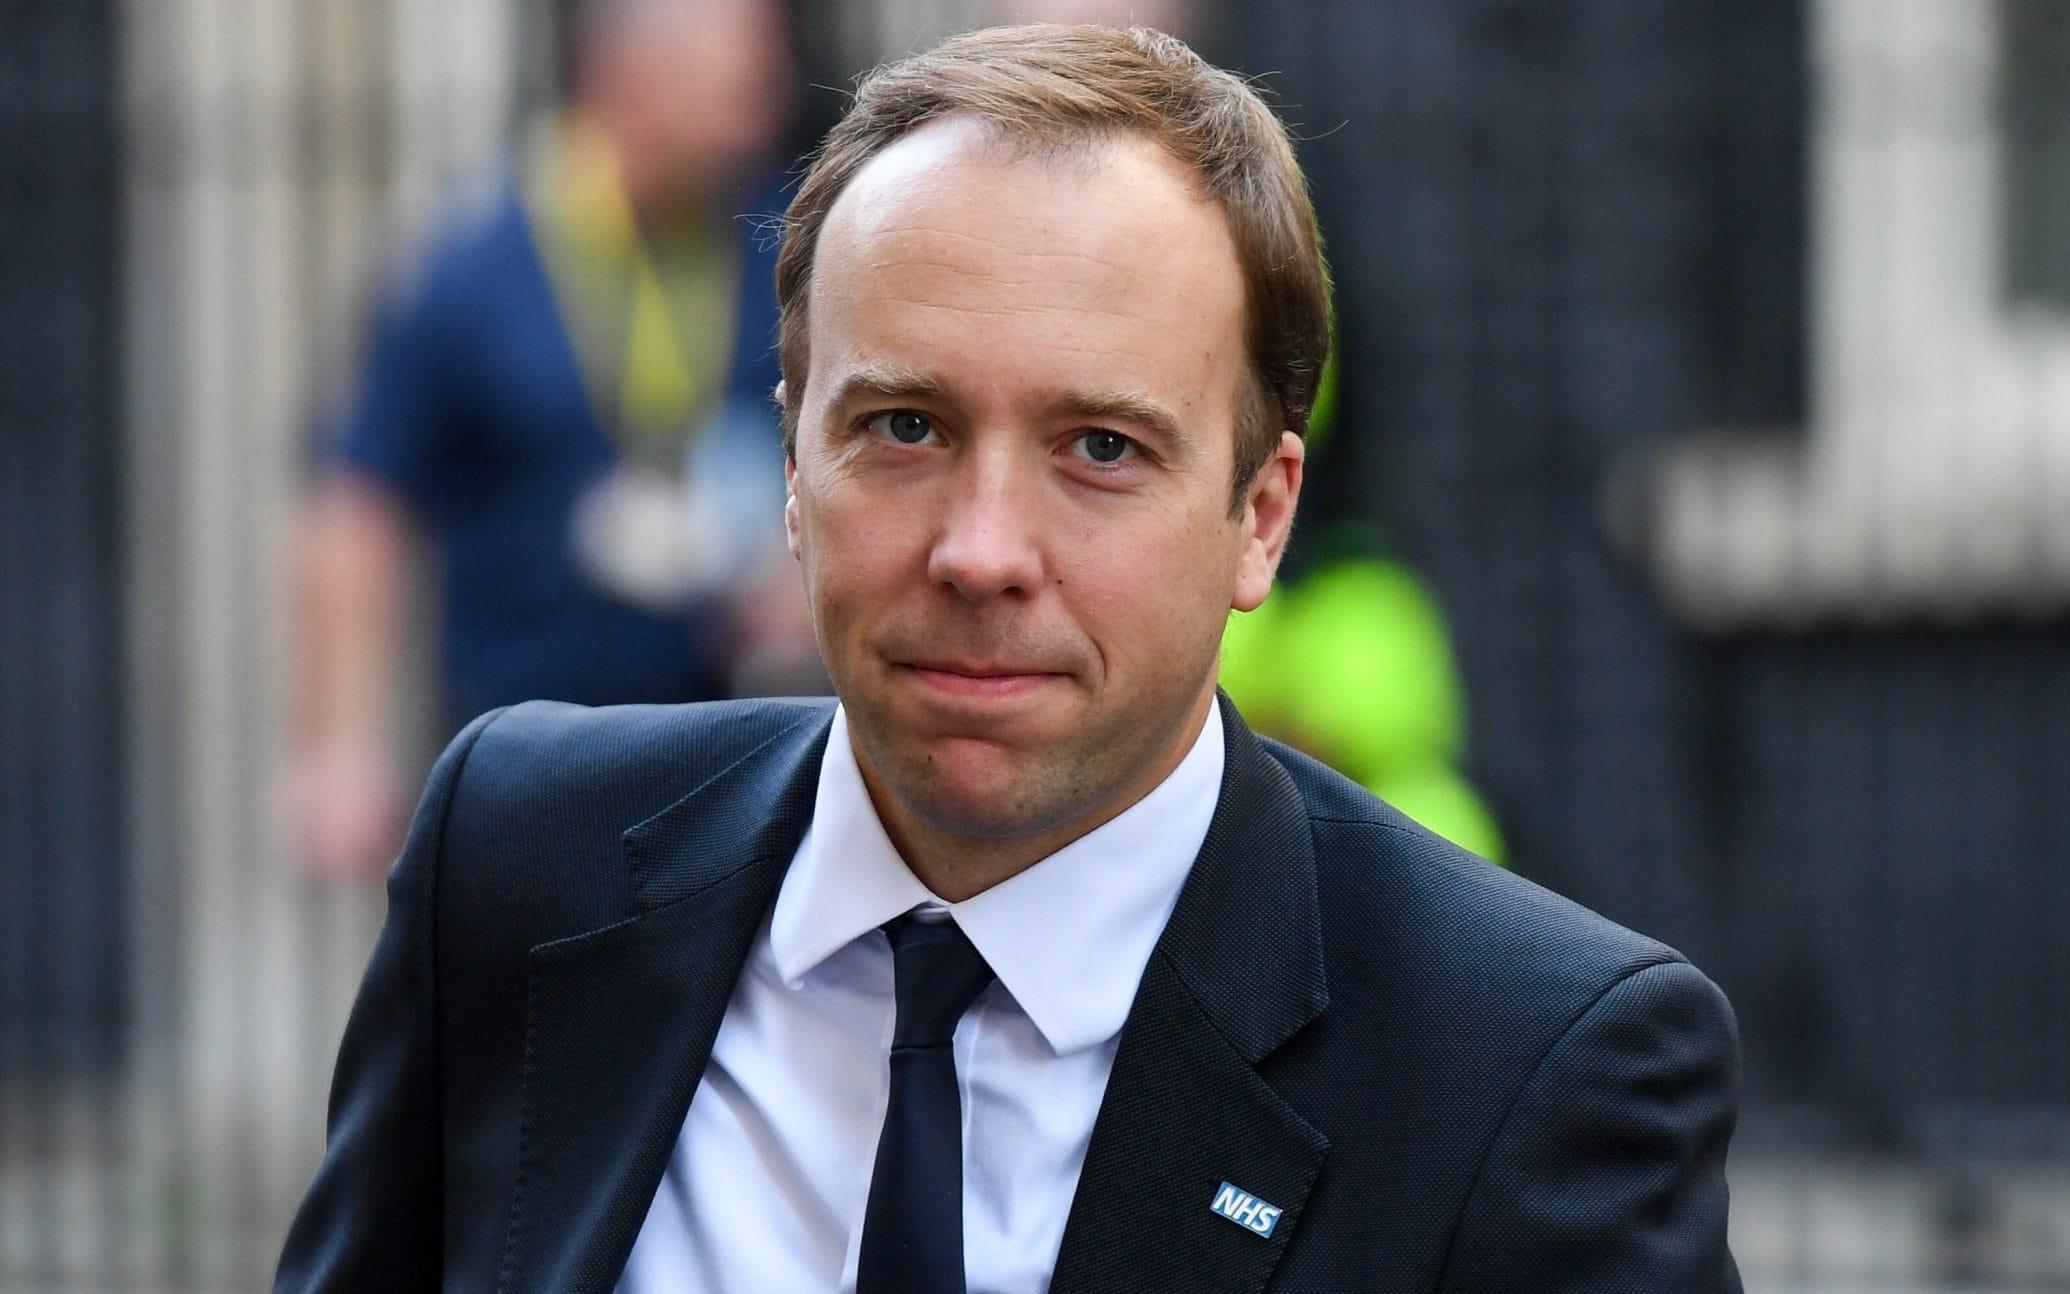 UK Health Secretary Defends Decision To Allow Cheltenham Festival